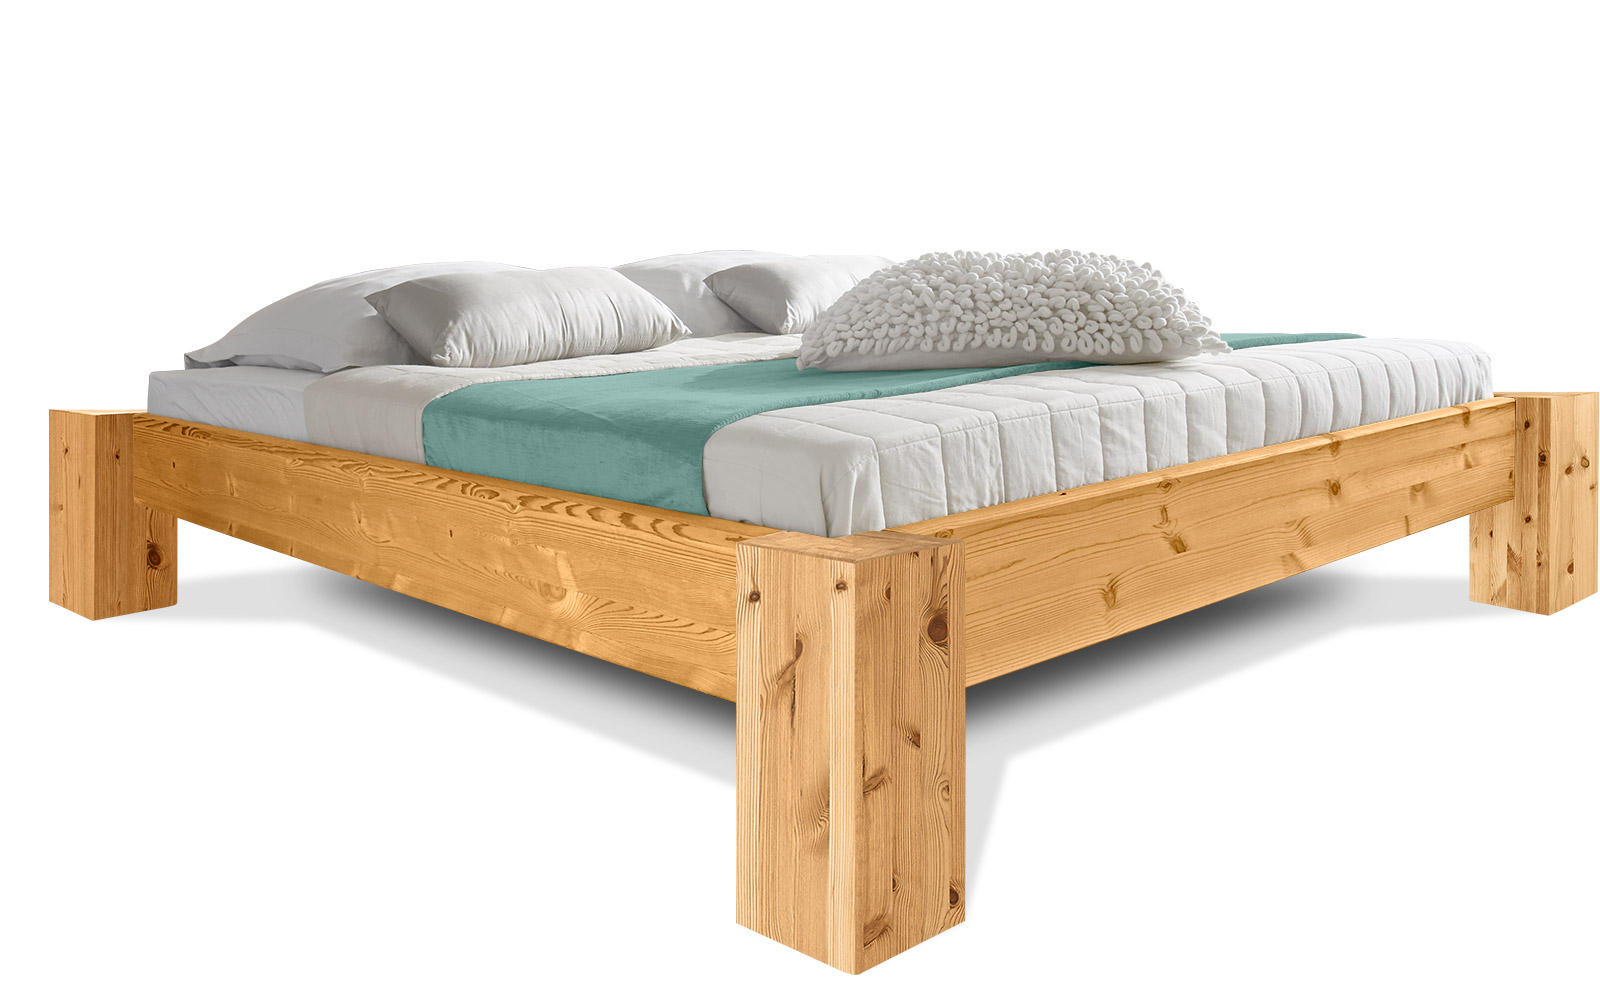 Full Size of Massivholzbett Easy Sleep 5 Komforthhe Online Bestellen Edofutonde Bett 200x200 Stauraum Funktions Betten Ikea 160x200 Günstig Kaufen 180x200 Mit Lattenrost Bett Bett 200x200 Komforthöhe